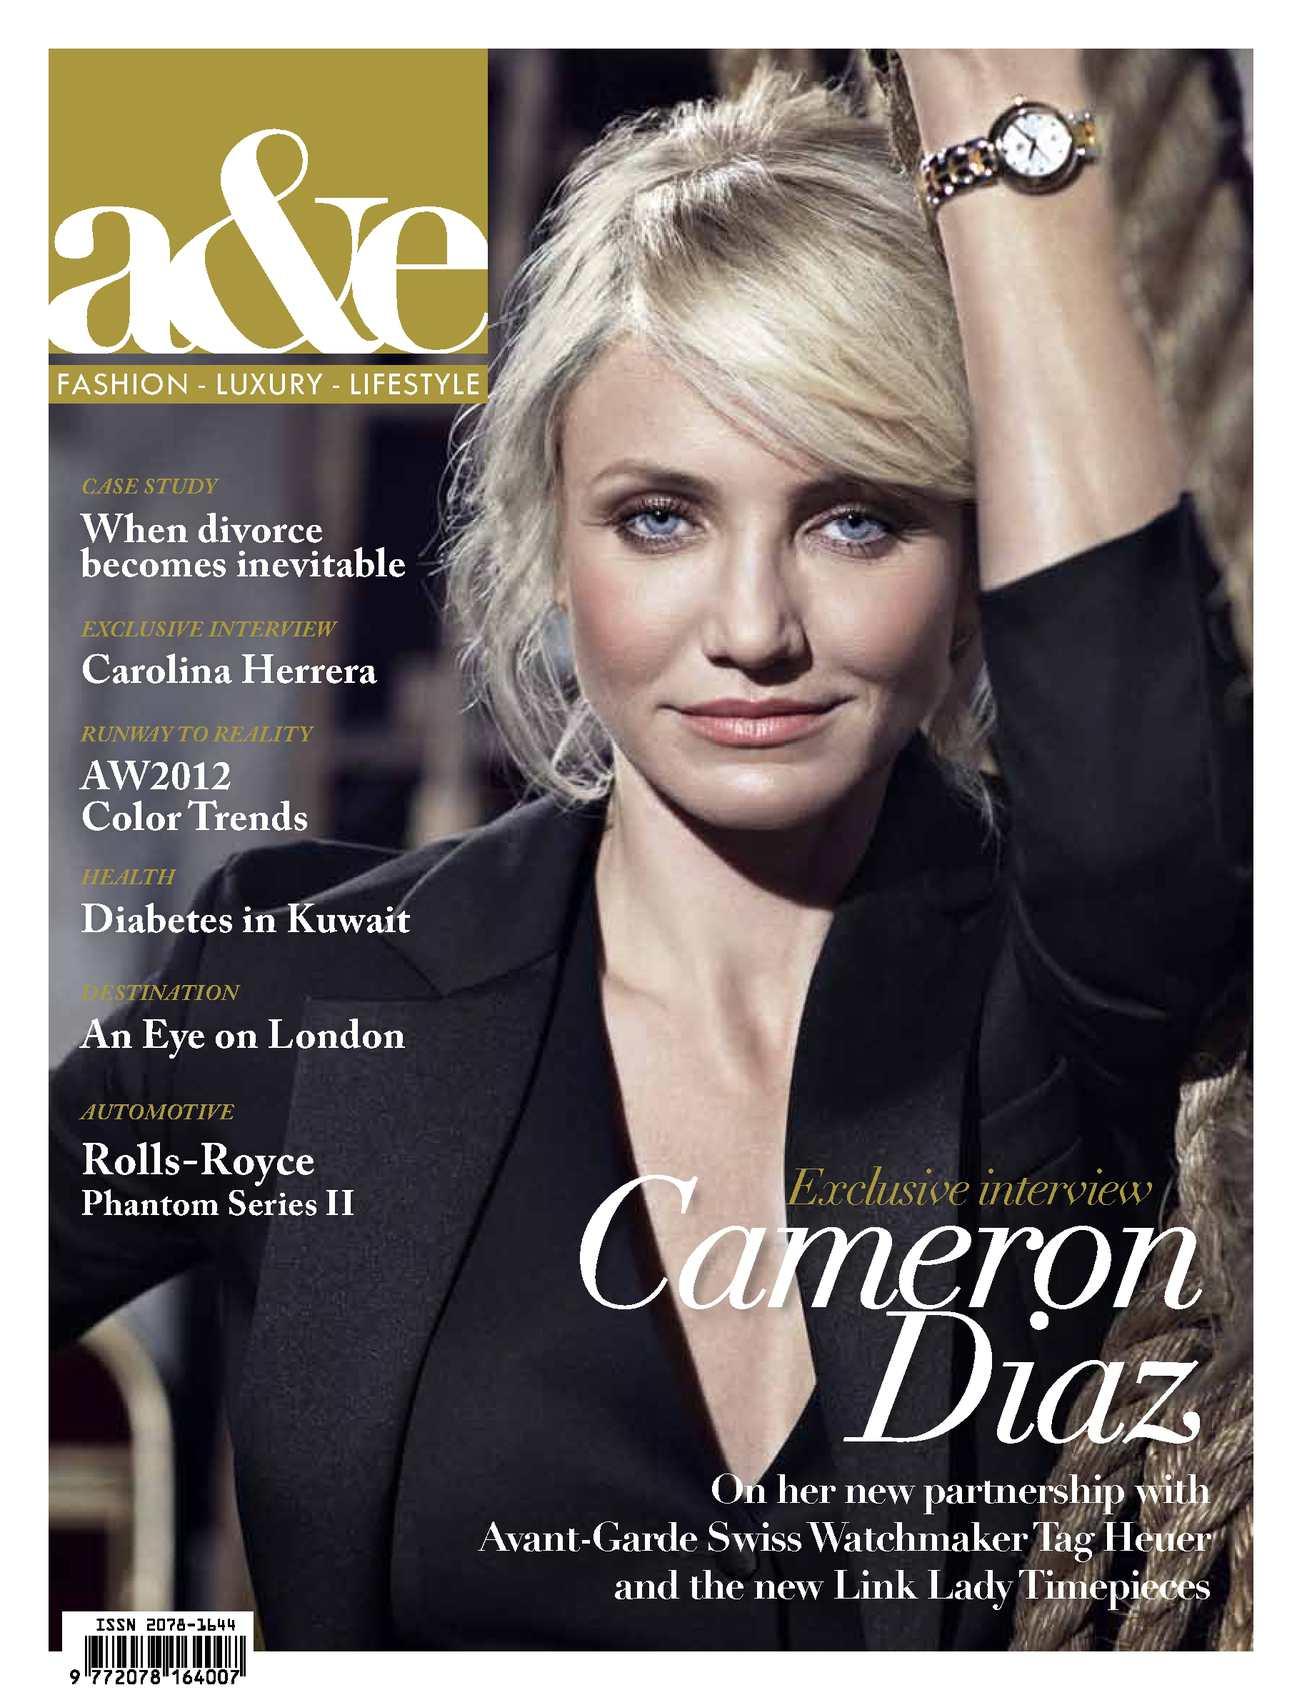 49c76d74f6 Calaméo - A&E (adam&eve) Magazine Kuwait Issue 01